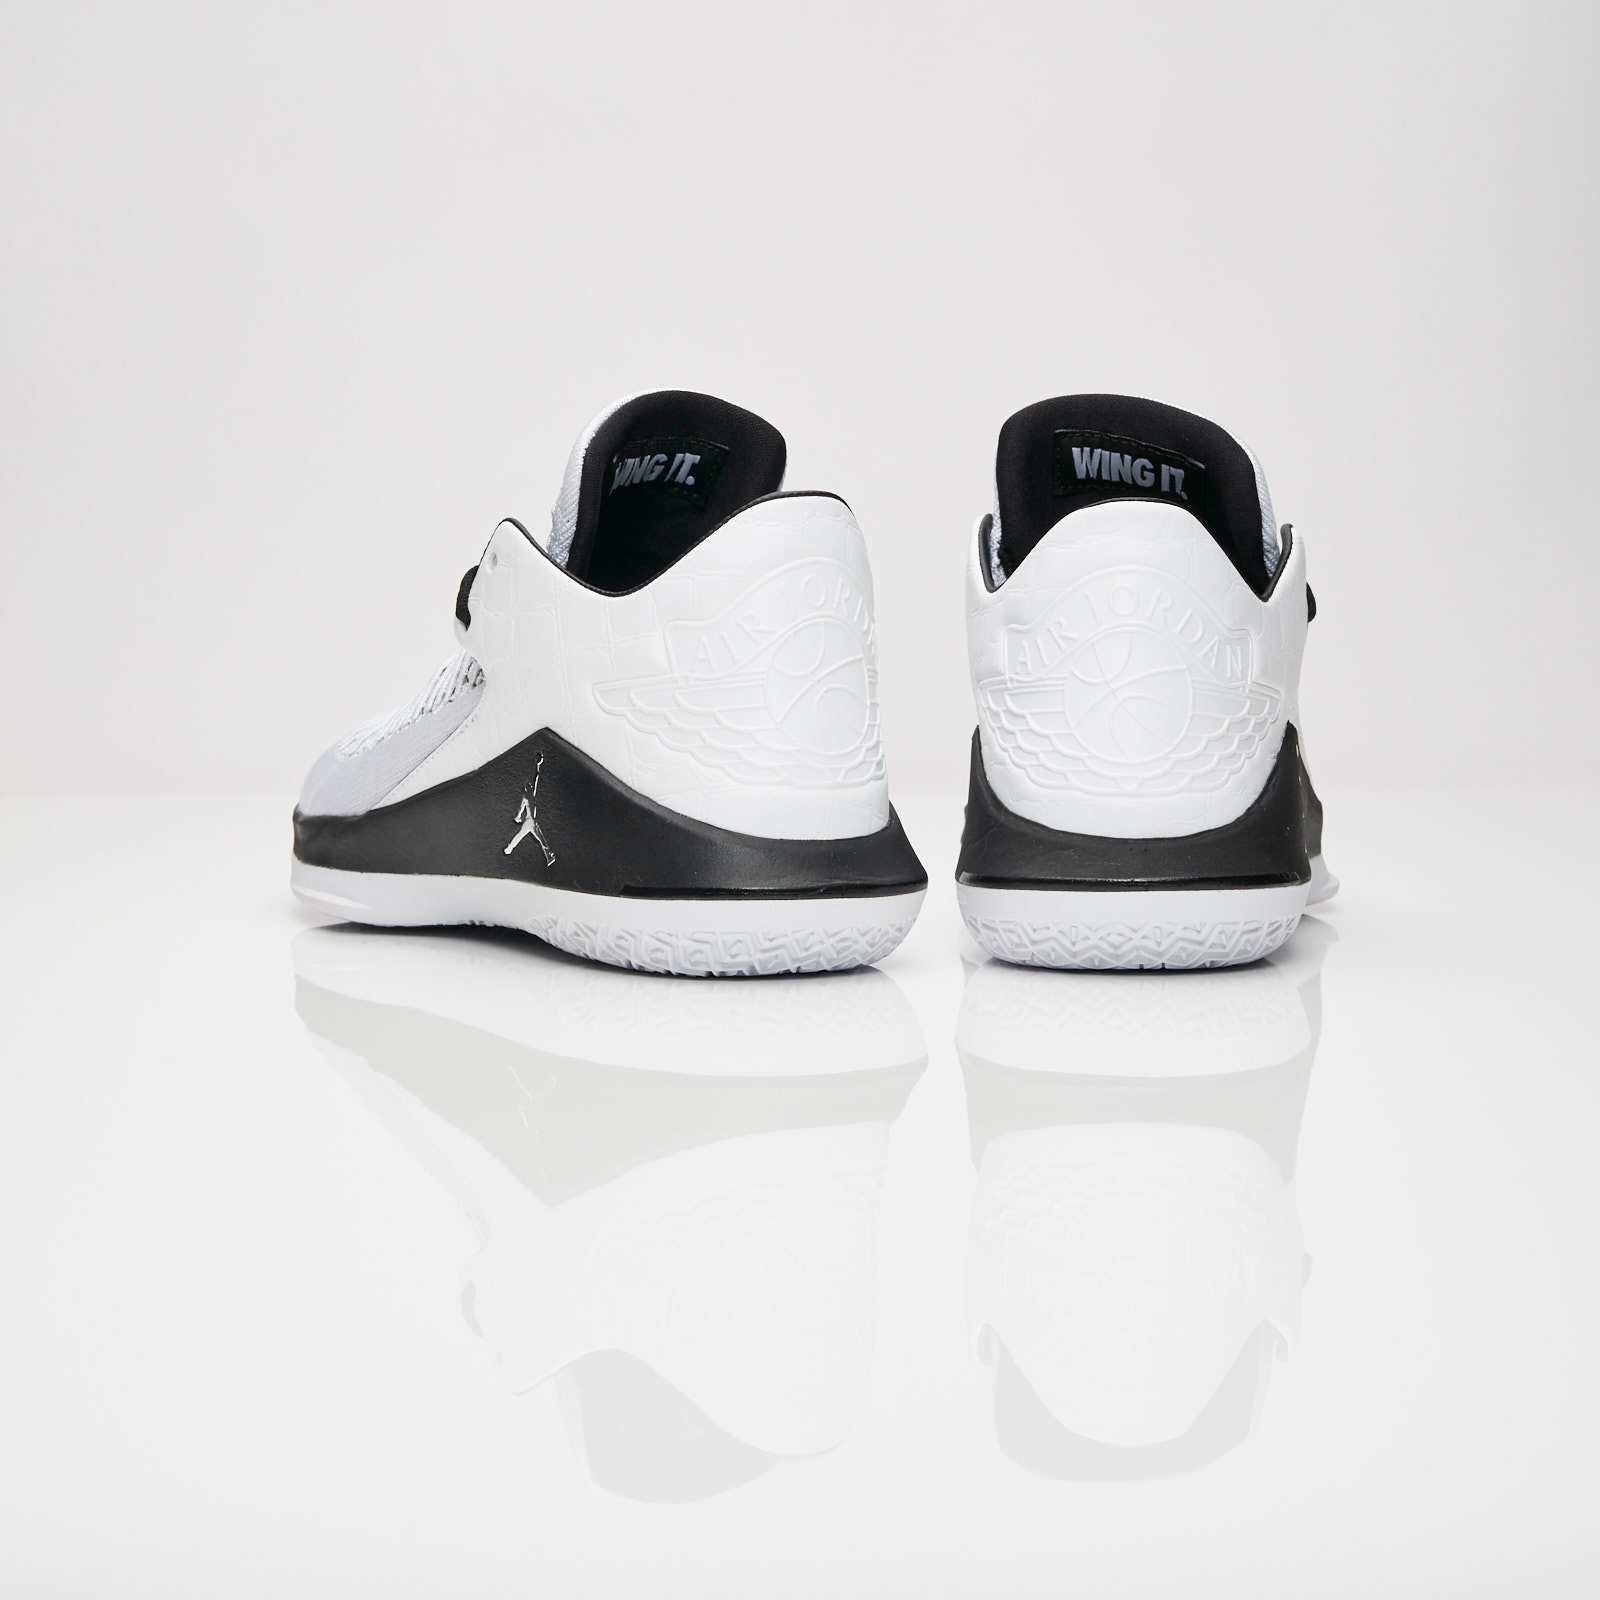 40abc2d127c436 Jordan Brand Air Jordan XXXII Low - Aa1256-102 - Sneakersnstuff ...